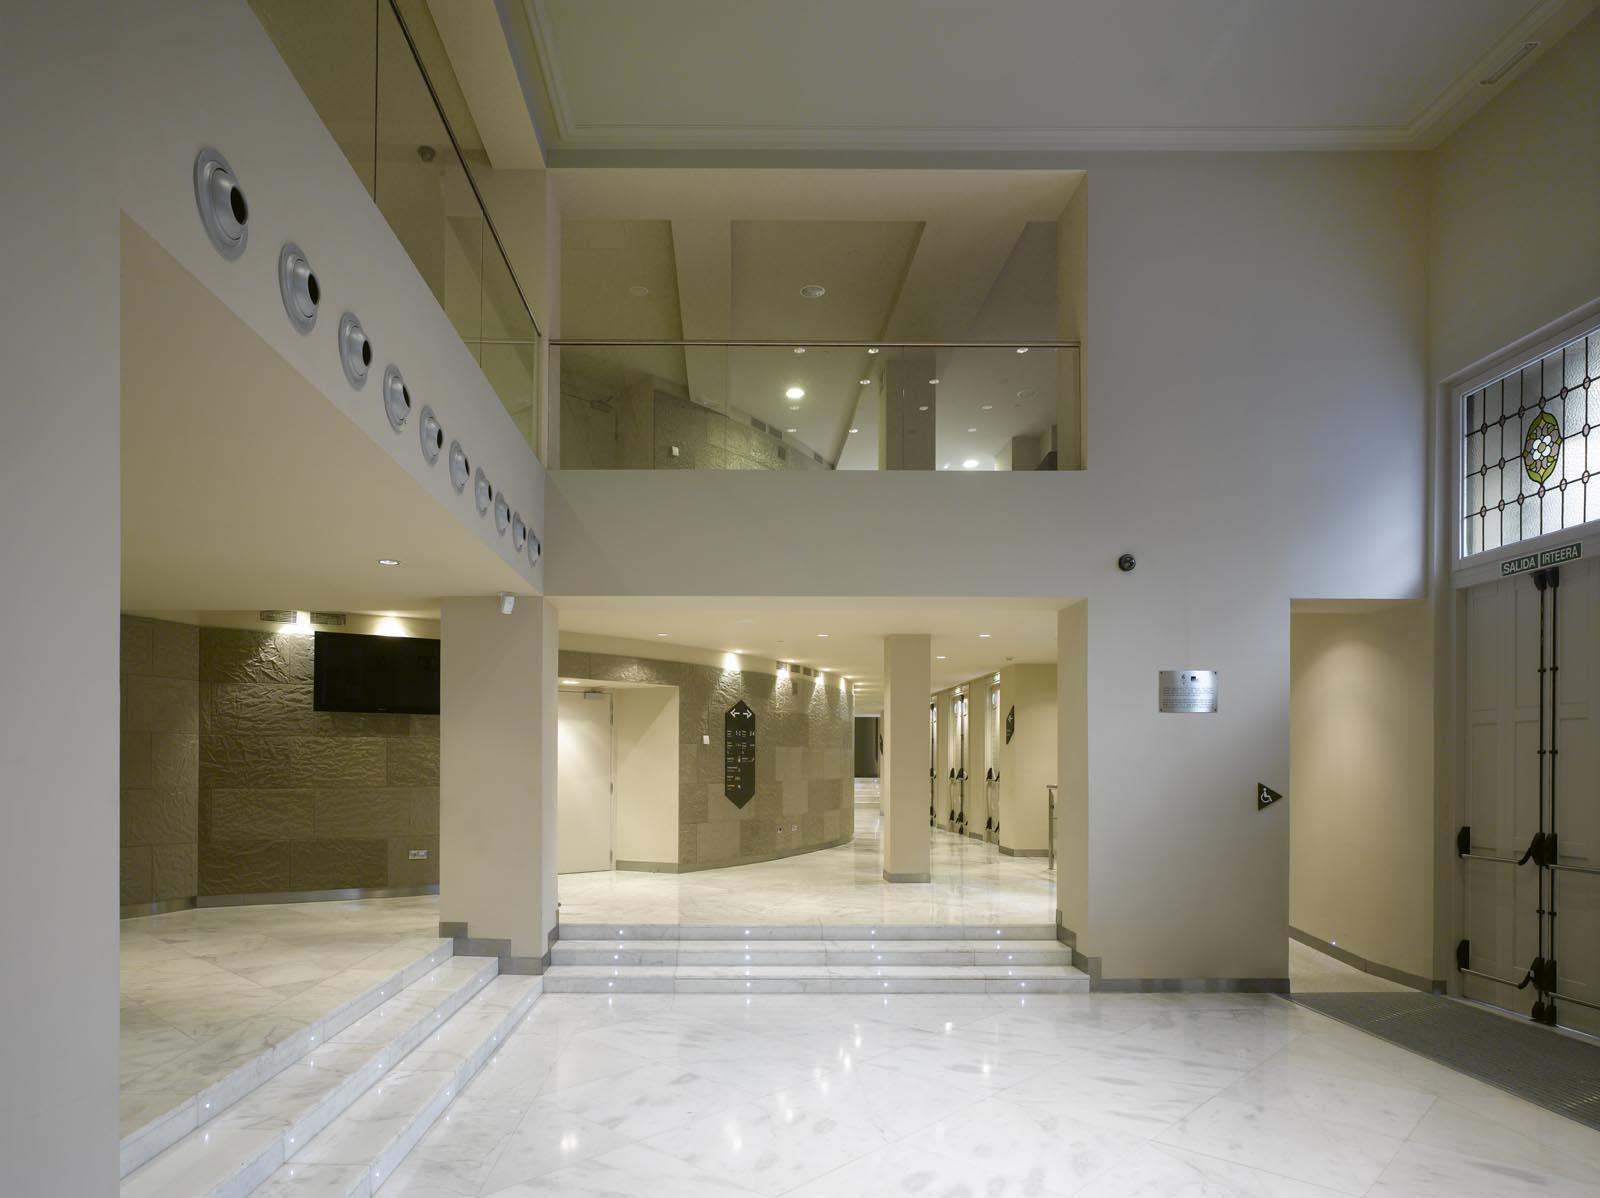 Teatro campos el seos de bilbao de joya modernista a sala tecnol gica - Estudios arquitectura bilbao ...